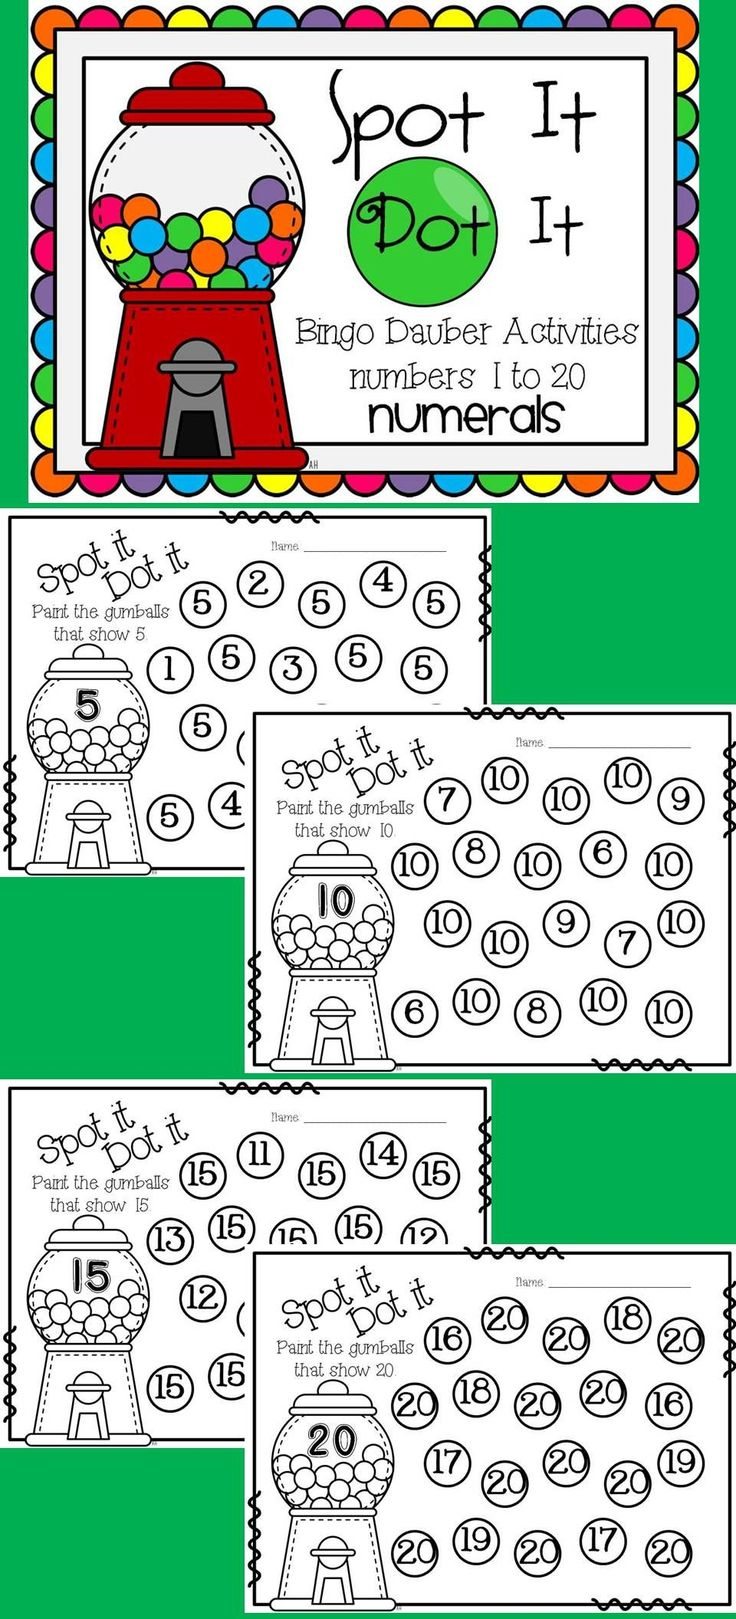 Spot It! Dot It! (Bingo Dauber Printables for Numbers to 20)